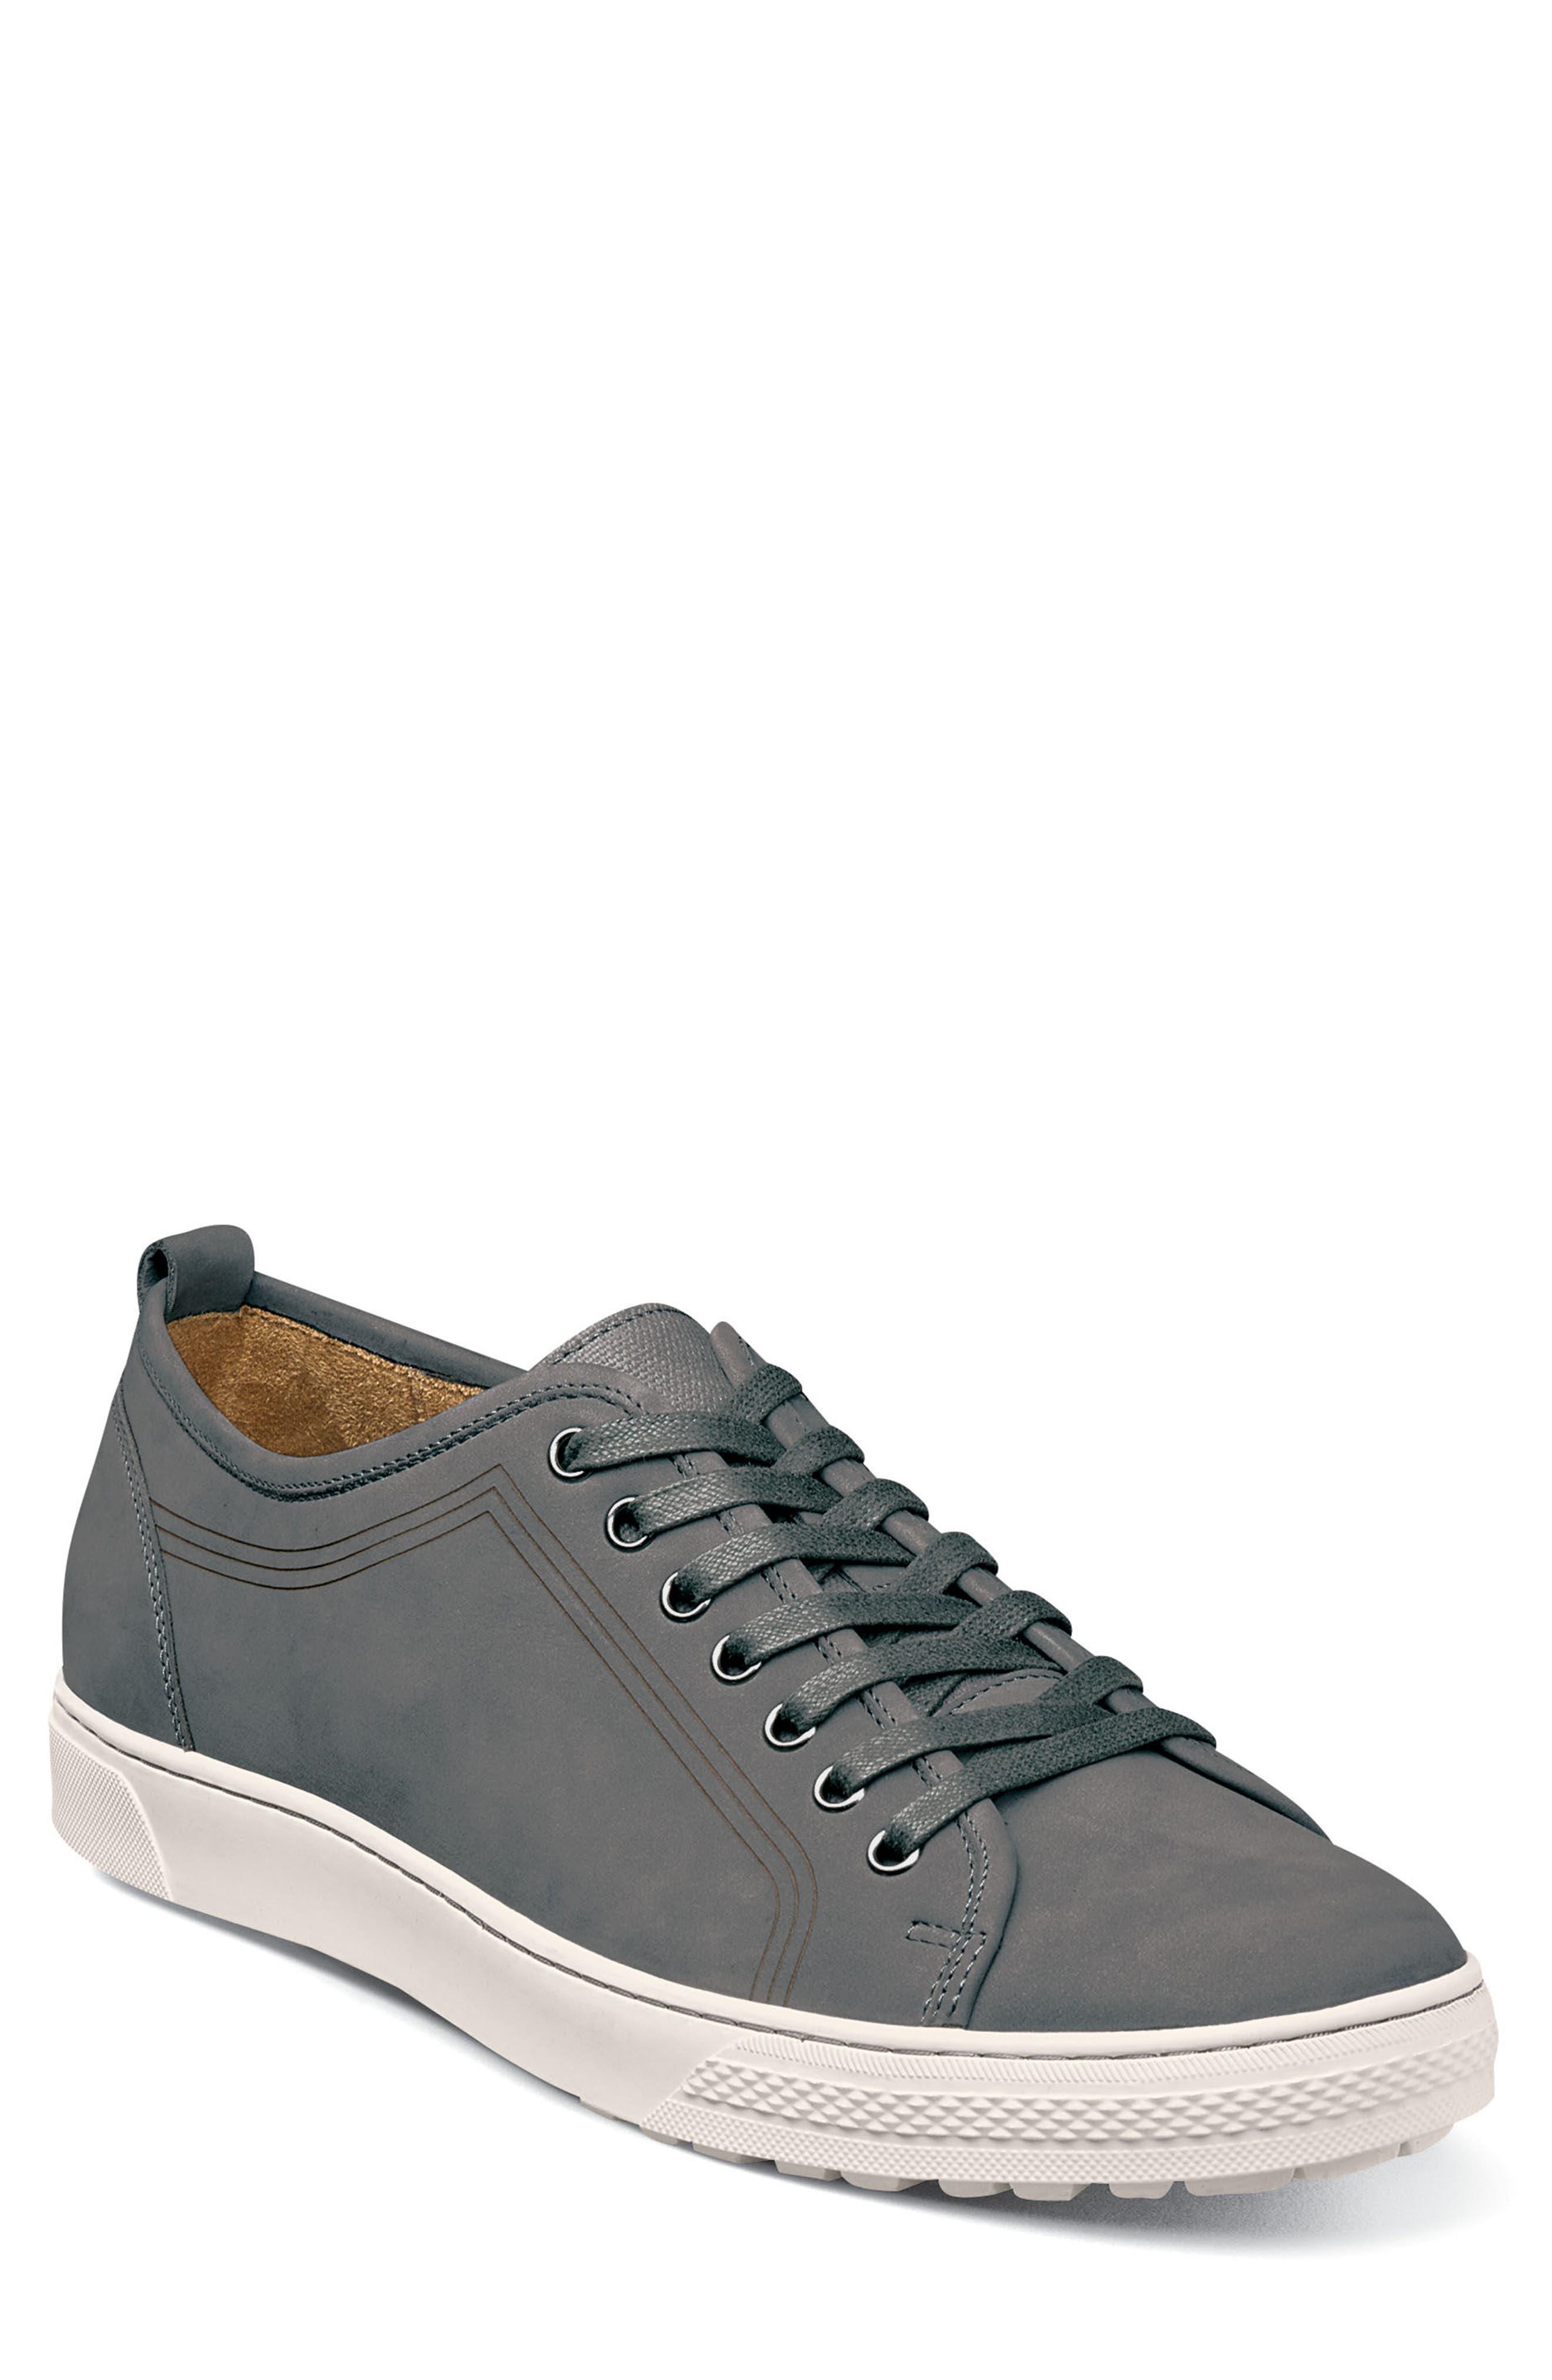 Forward Lo Sneaker,                             Main thumbnail 3, color,